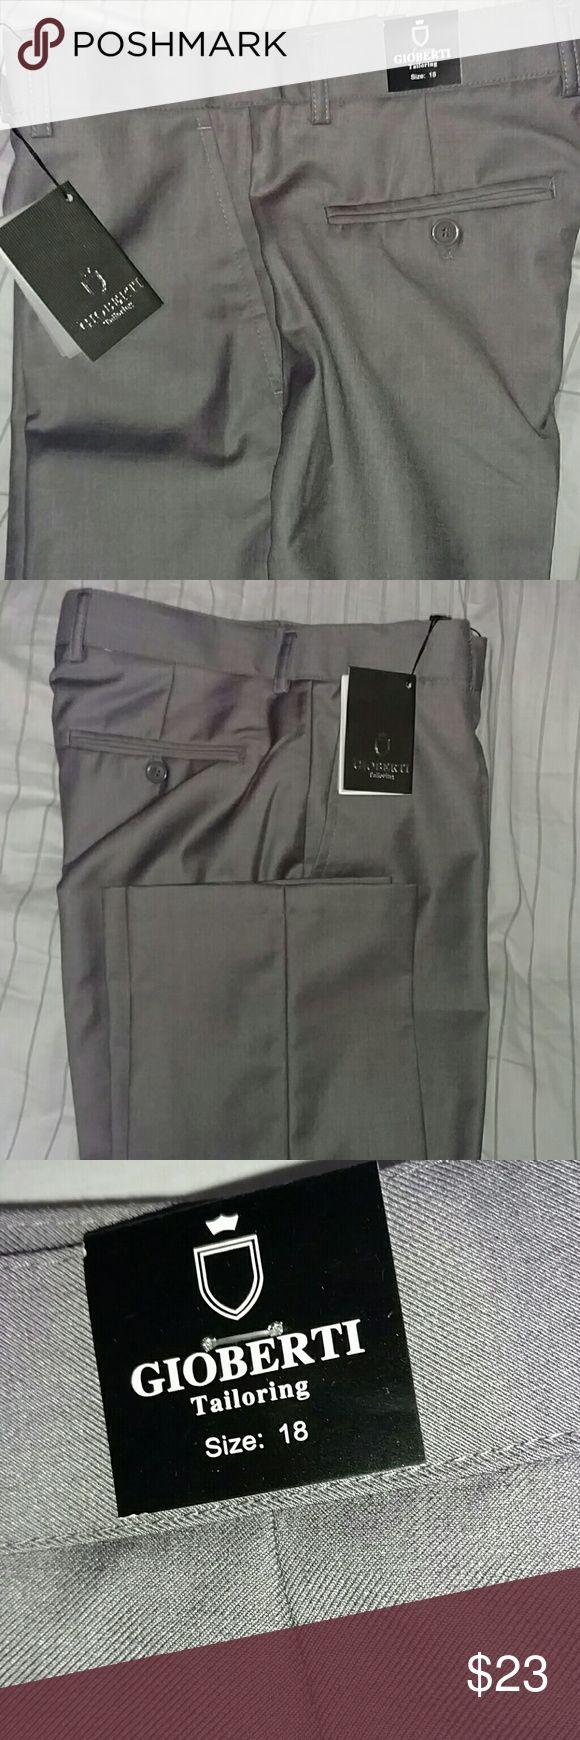 Gioberti boys grey dress pants Boys Grey Flat front dress pants with 2-4 adjustable waist. Gioberti Bottoms Formal